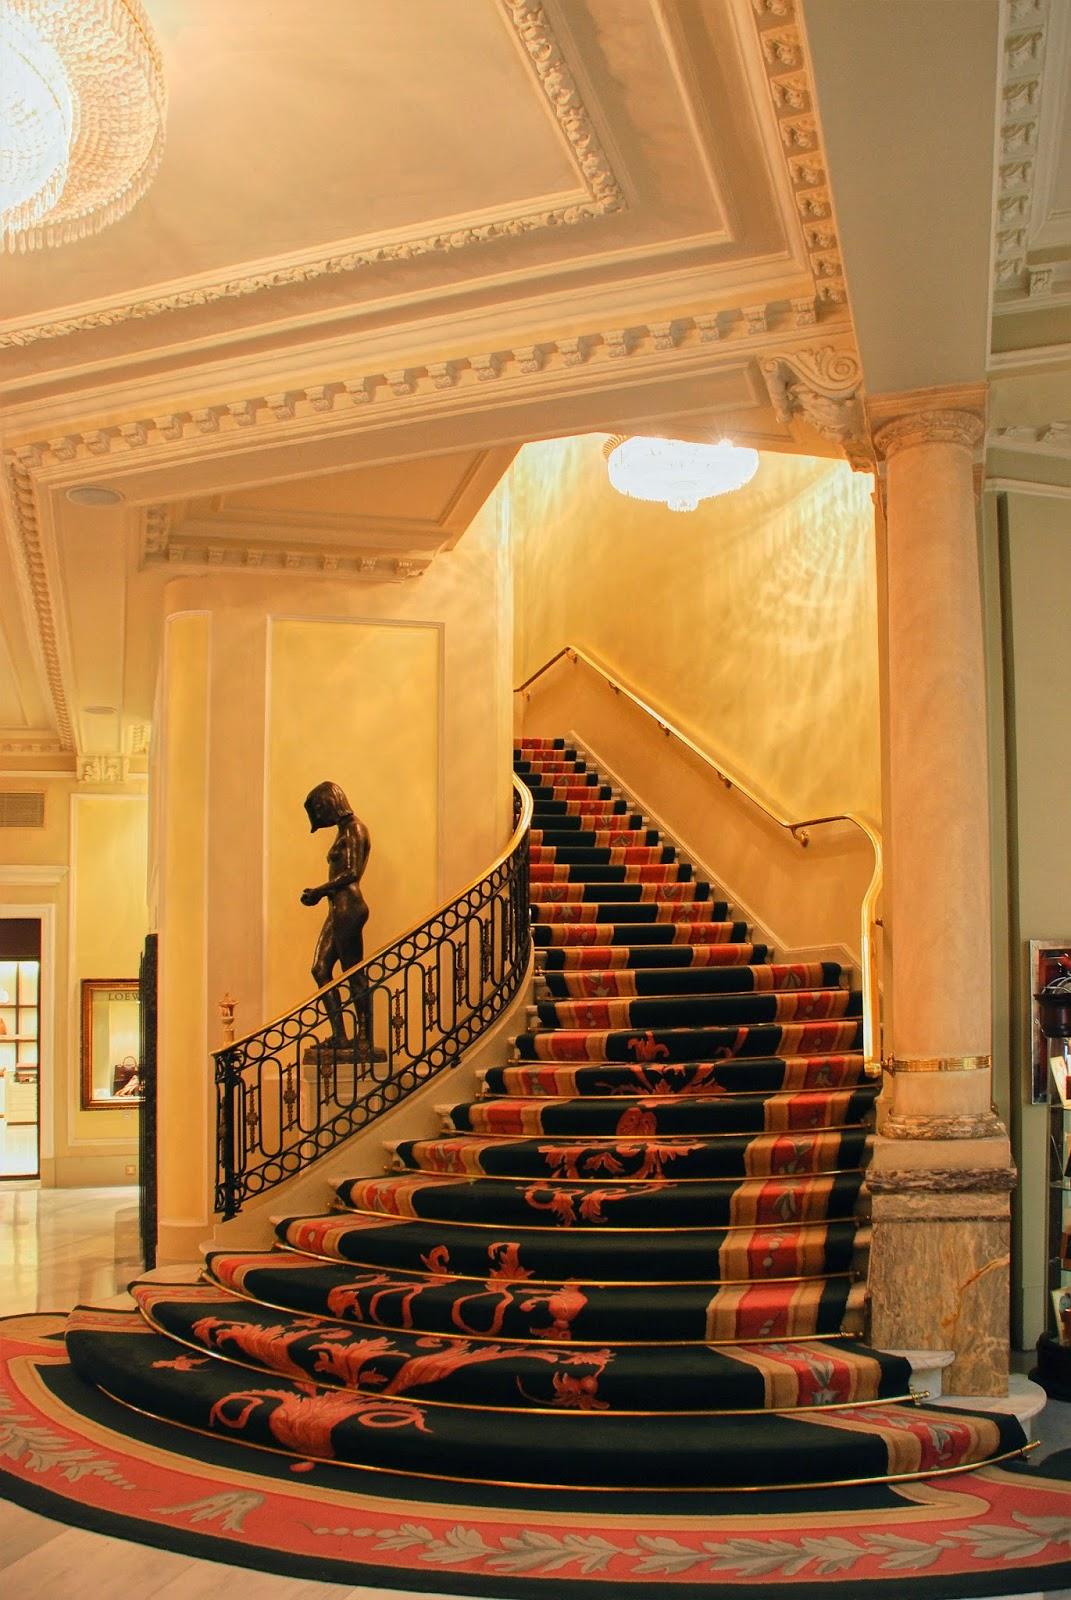 Hotel Palace - Escalera interior.